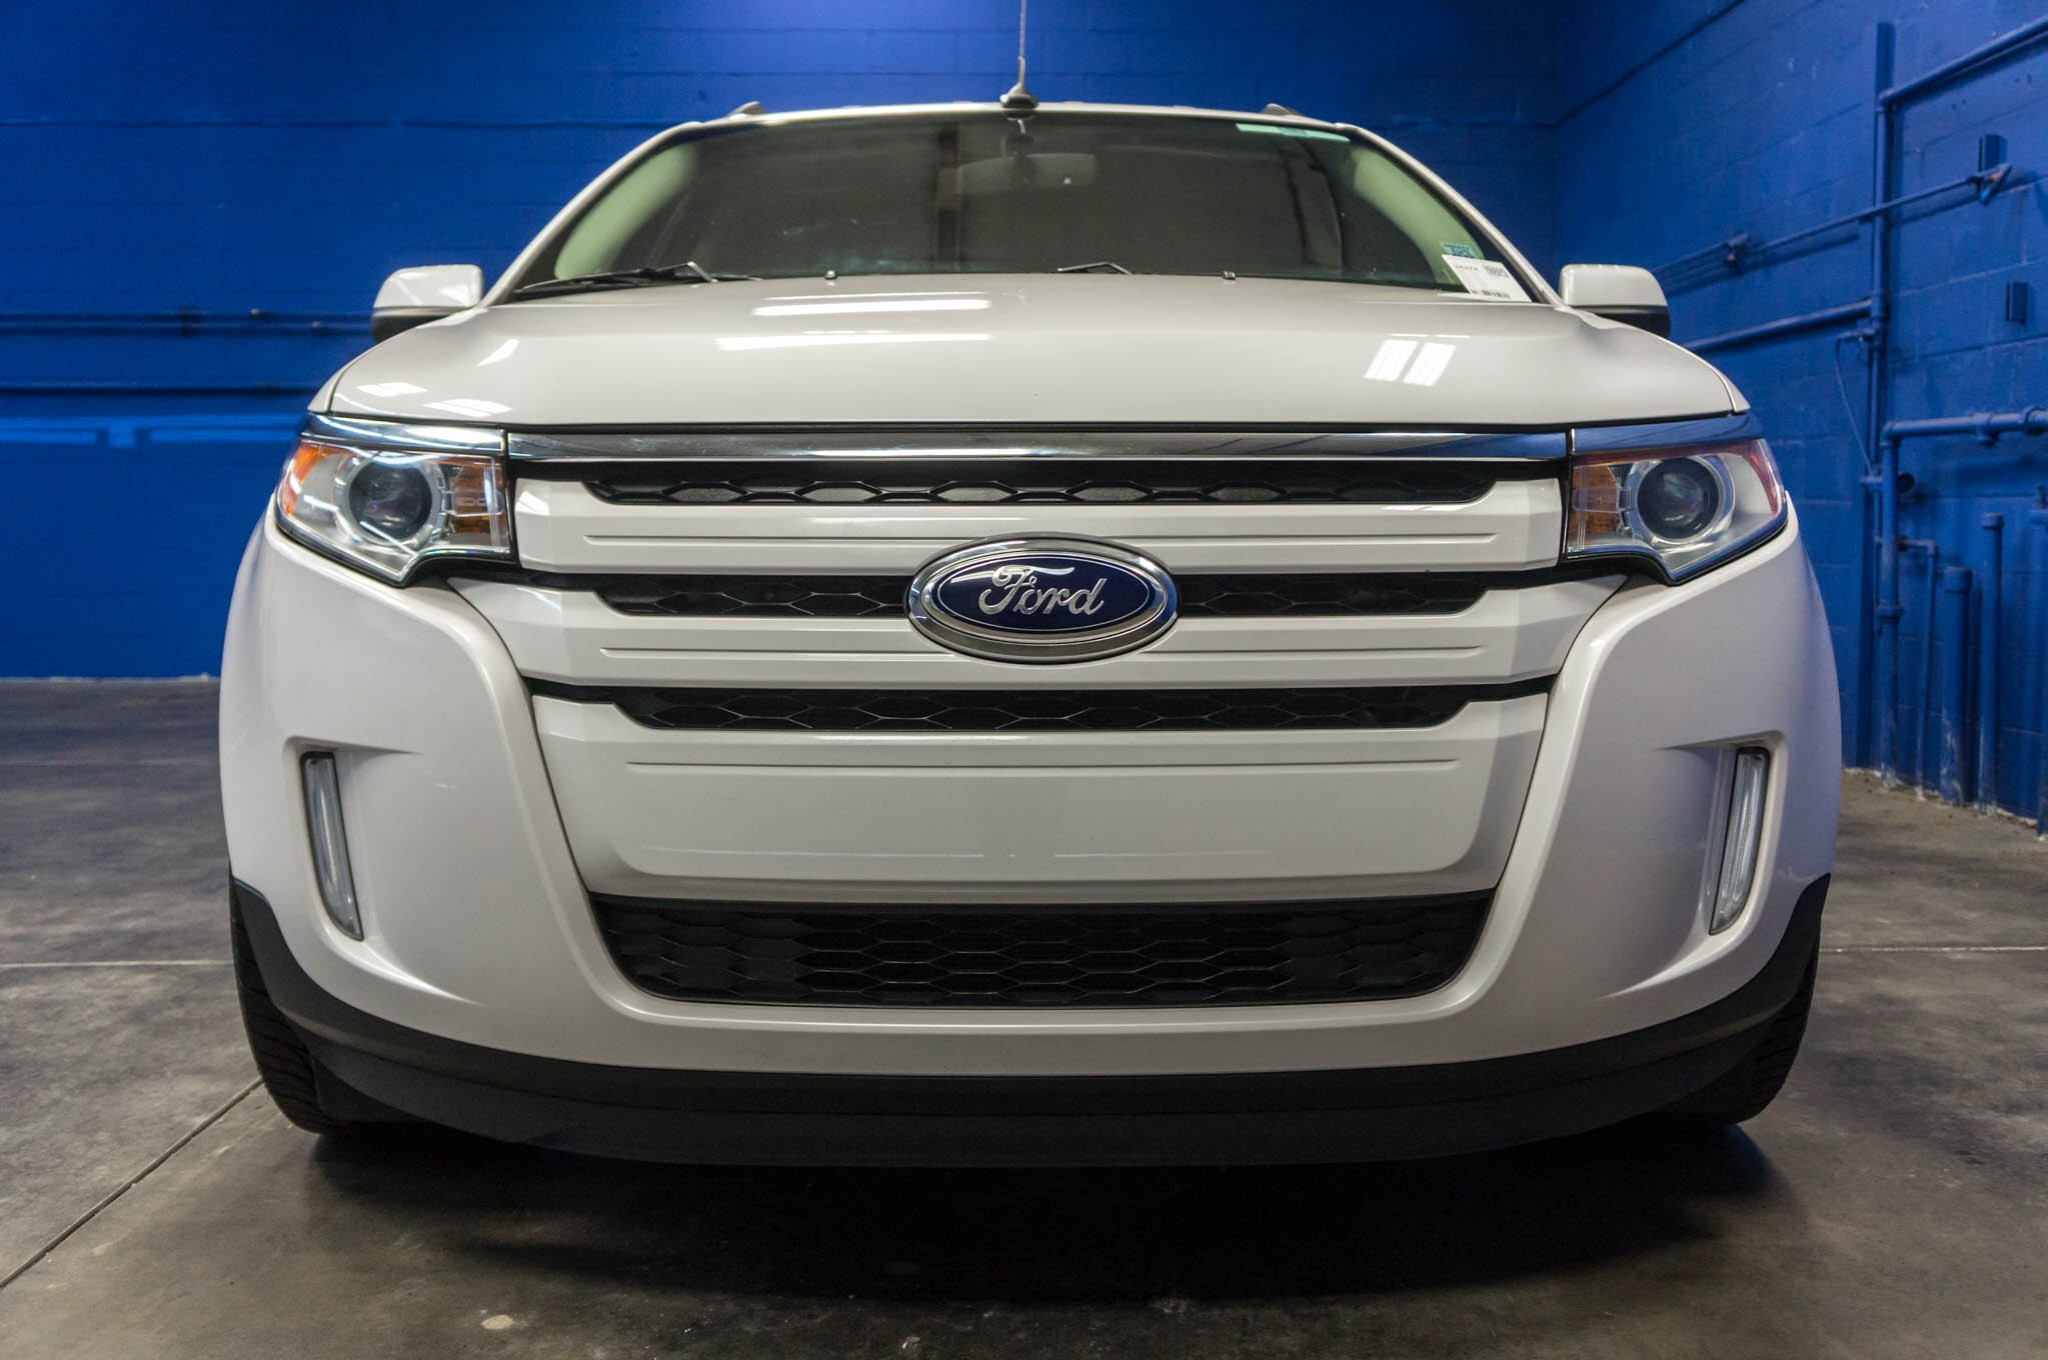 sel en edge review ford car awd reviews